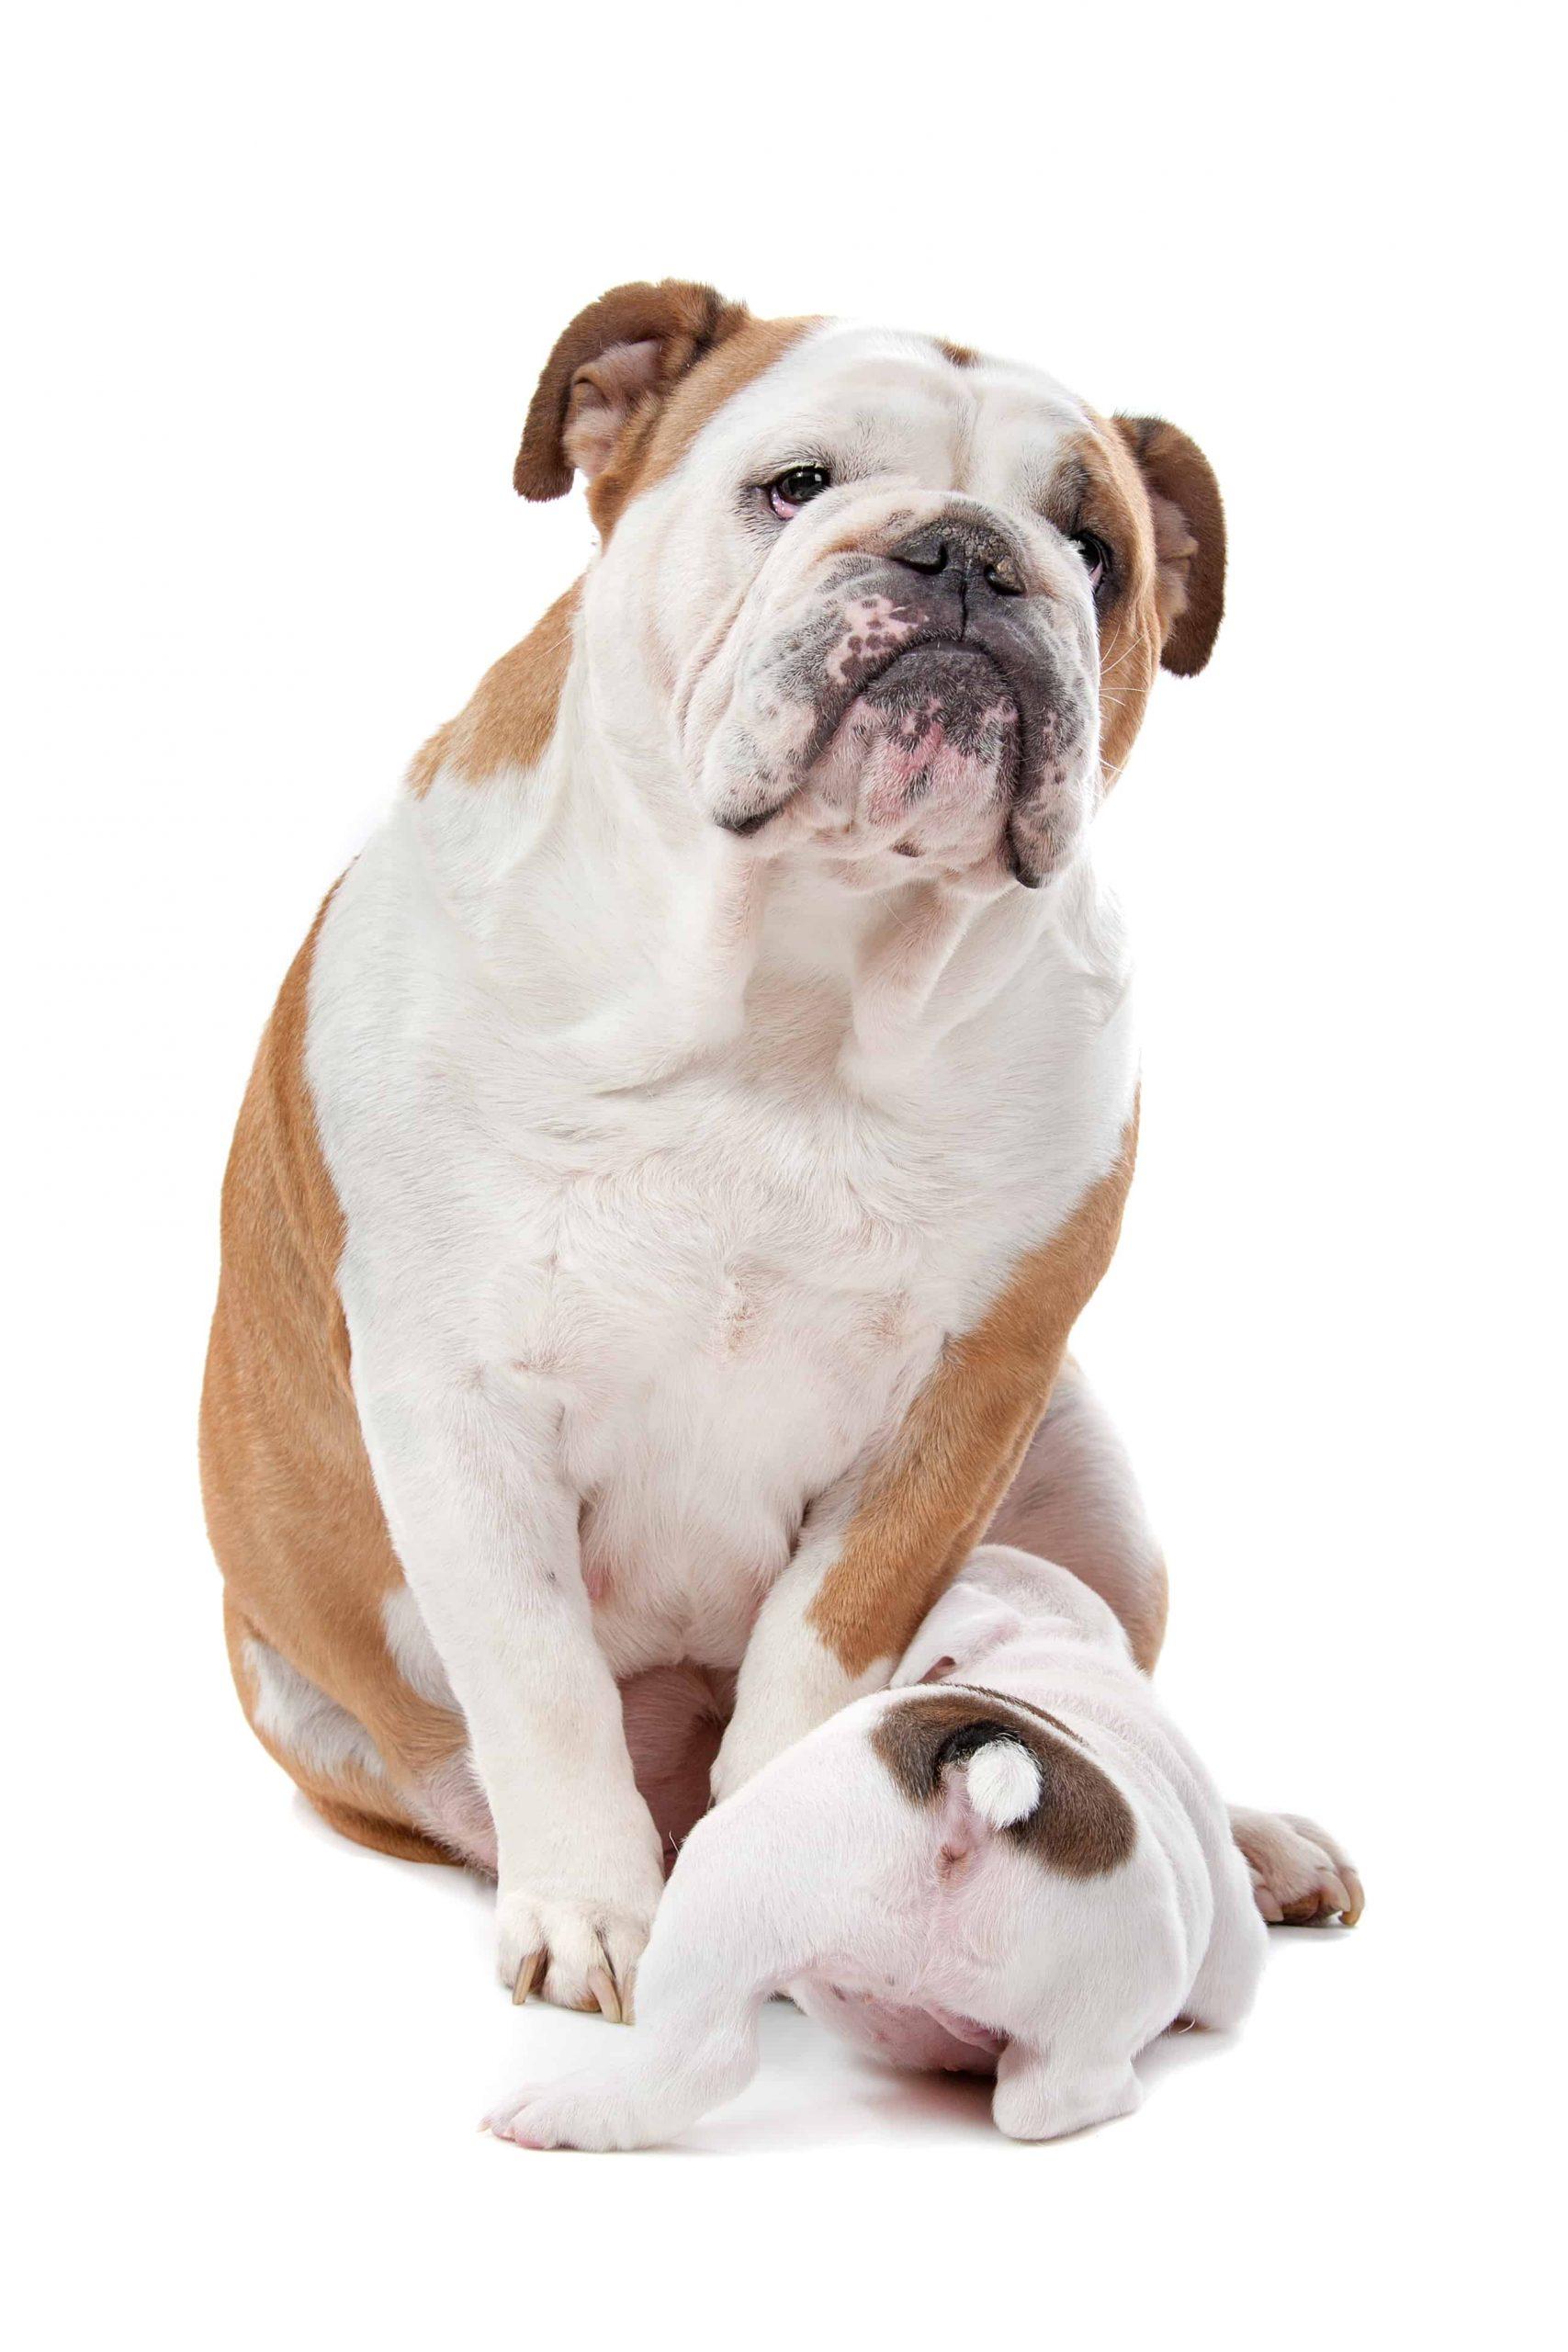 Bulldog and puppy